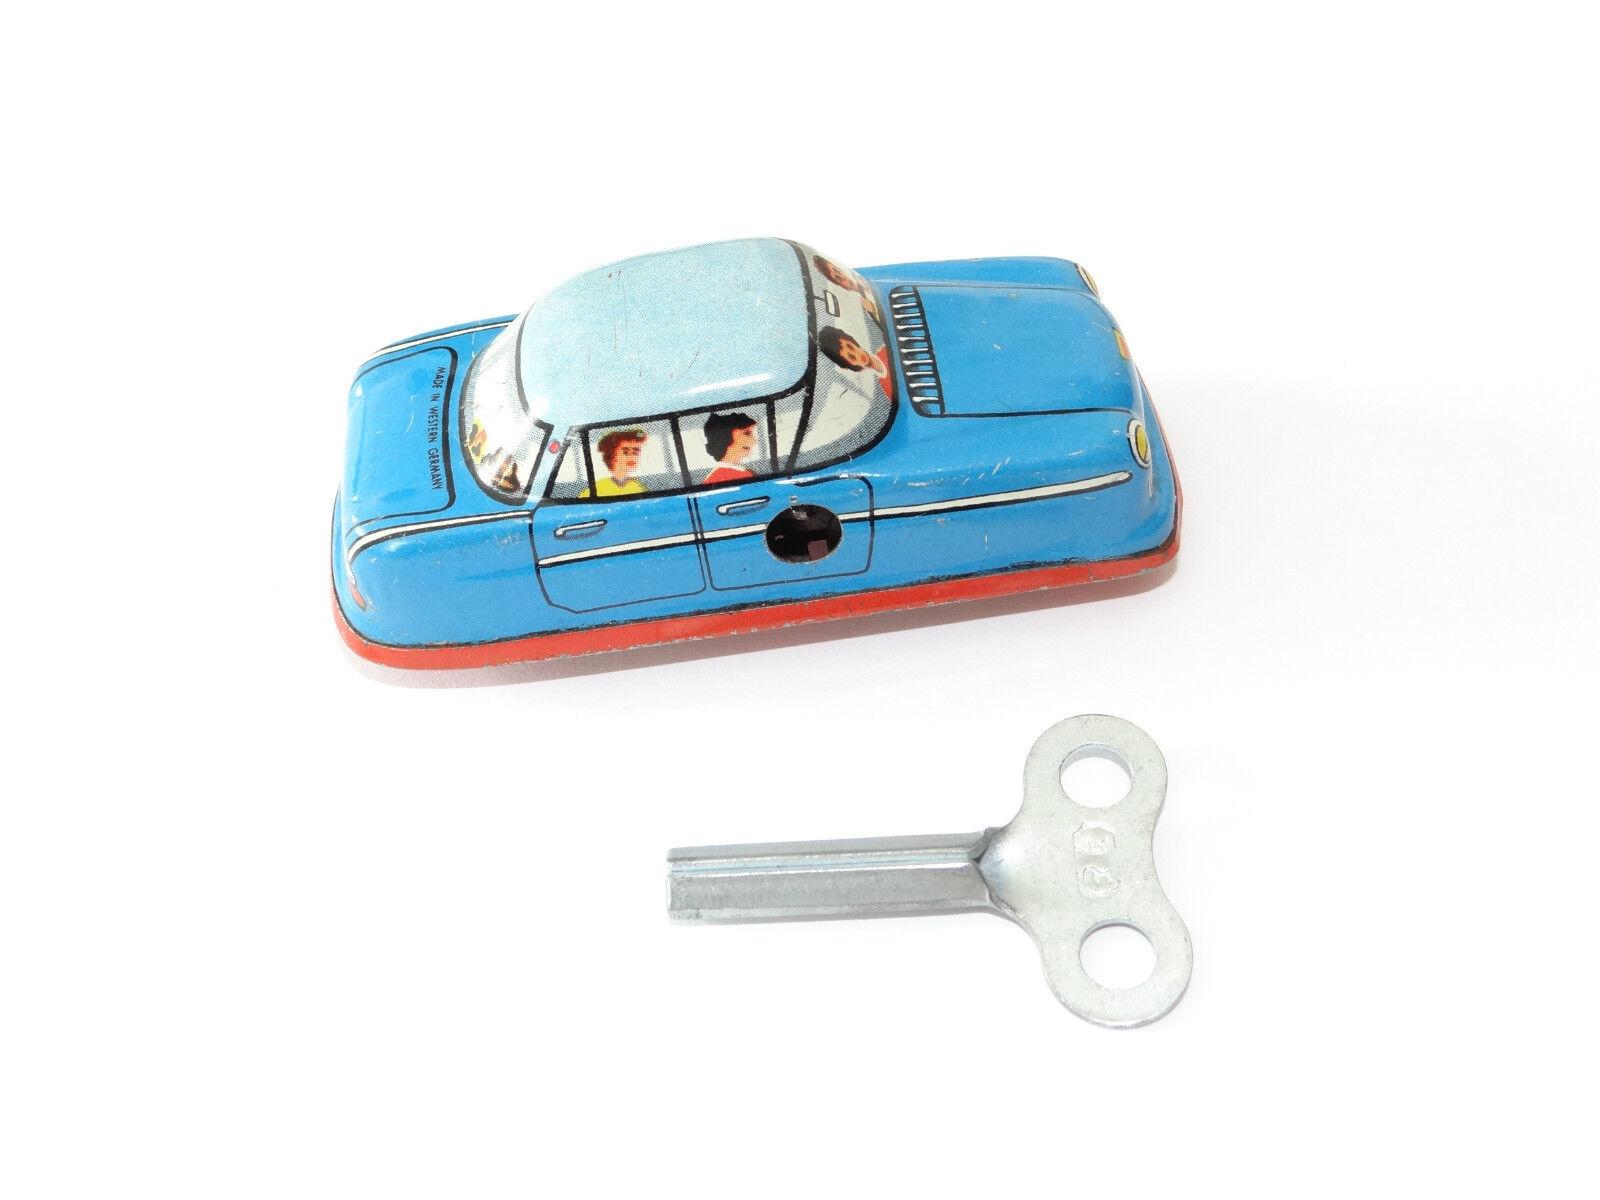 Blechspielzeug Blech Auto Mechanisch Car Vintage Retro Spielzeug Toy Toy Toy 35d23e